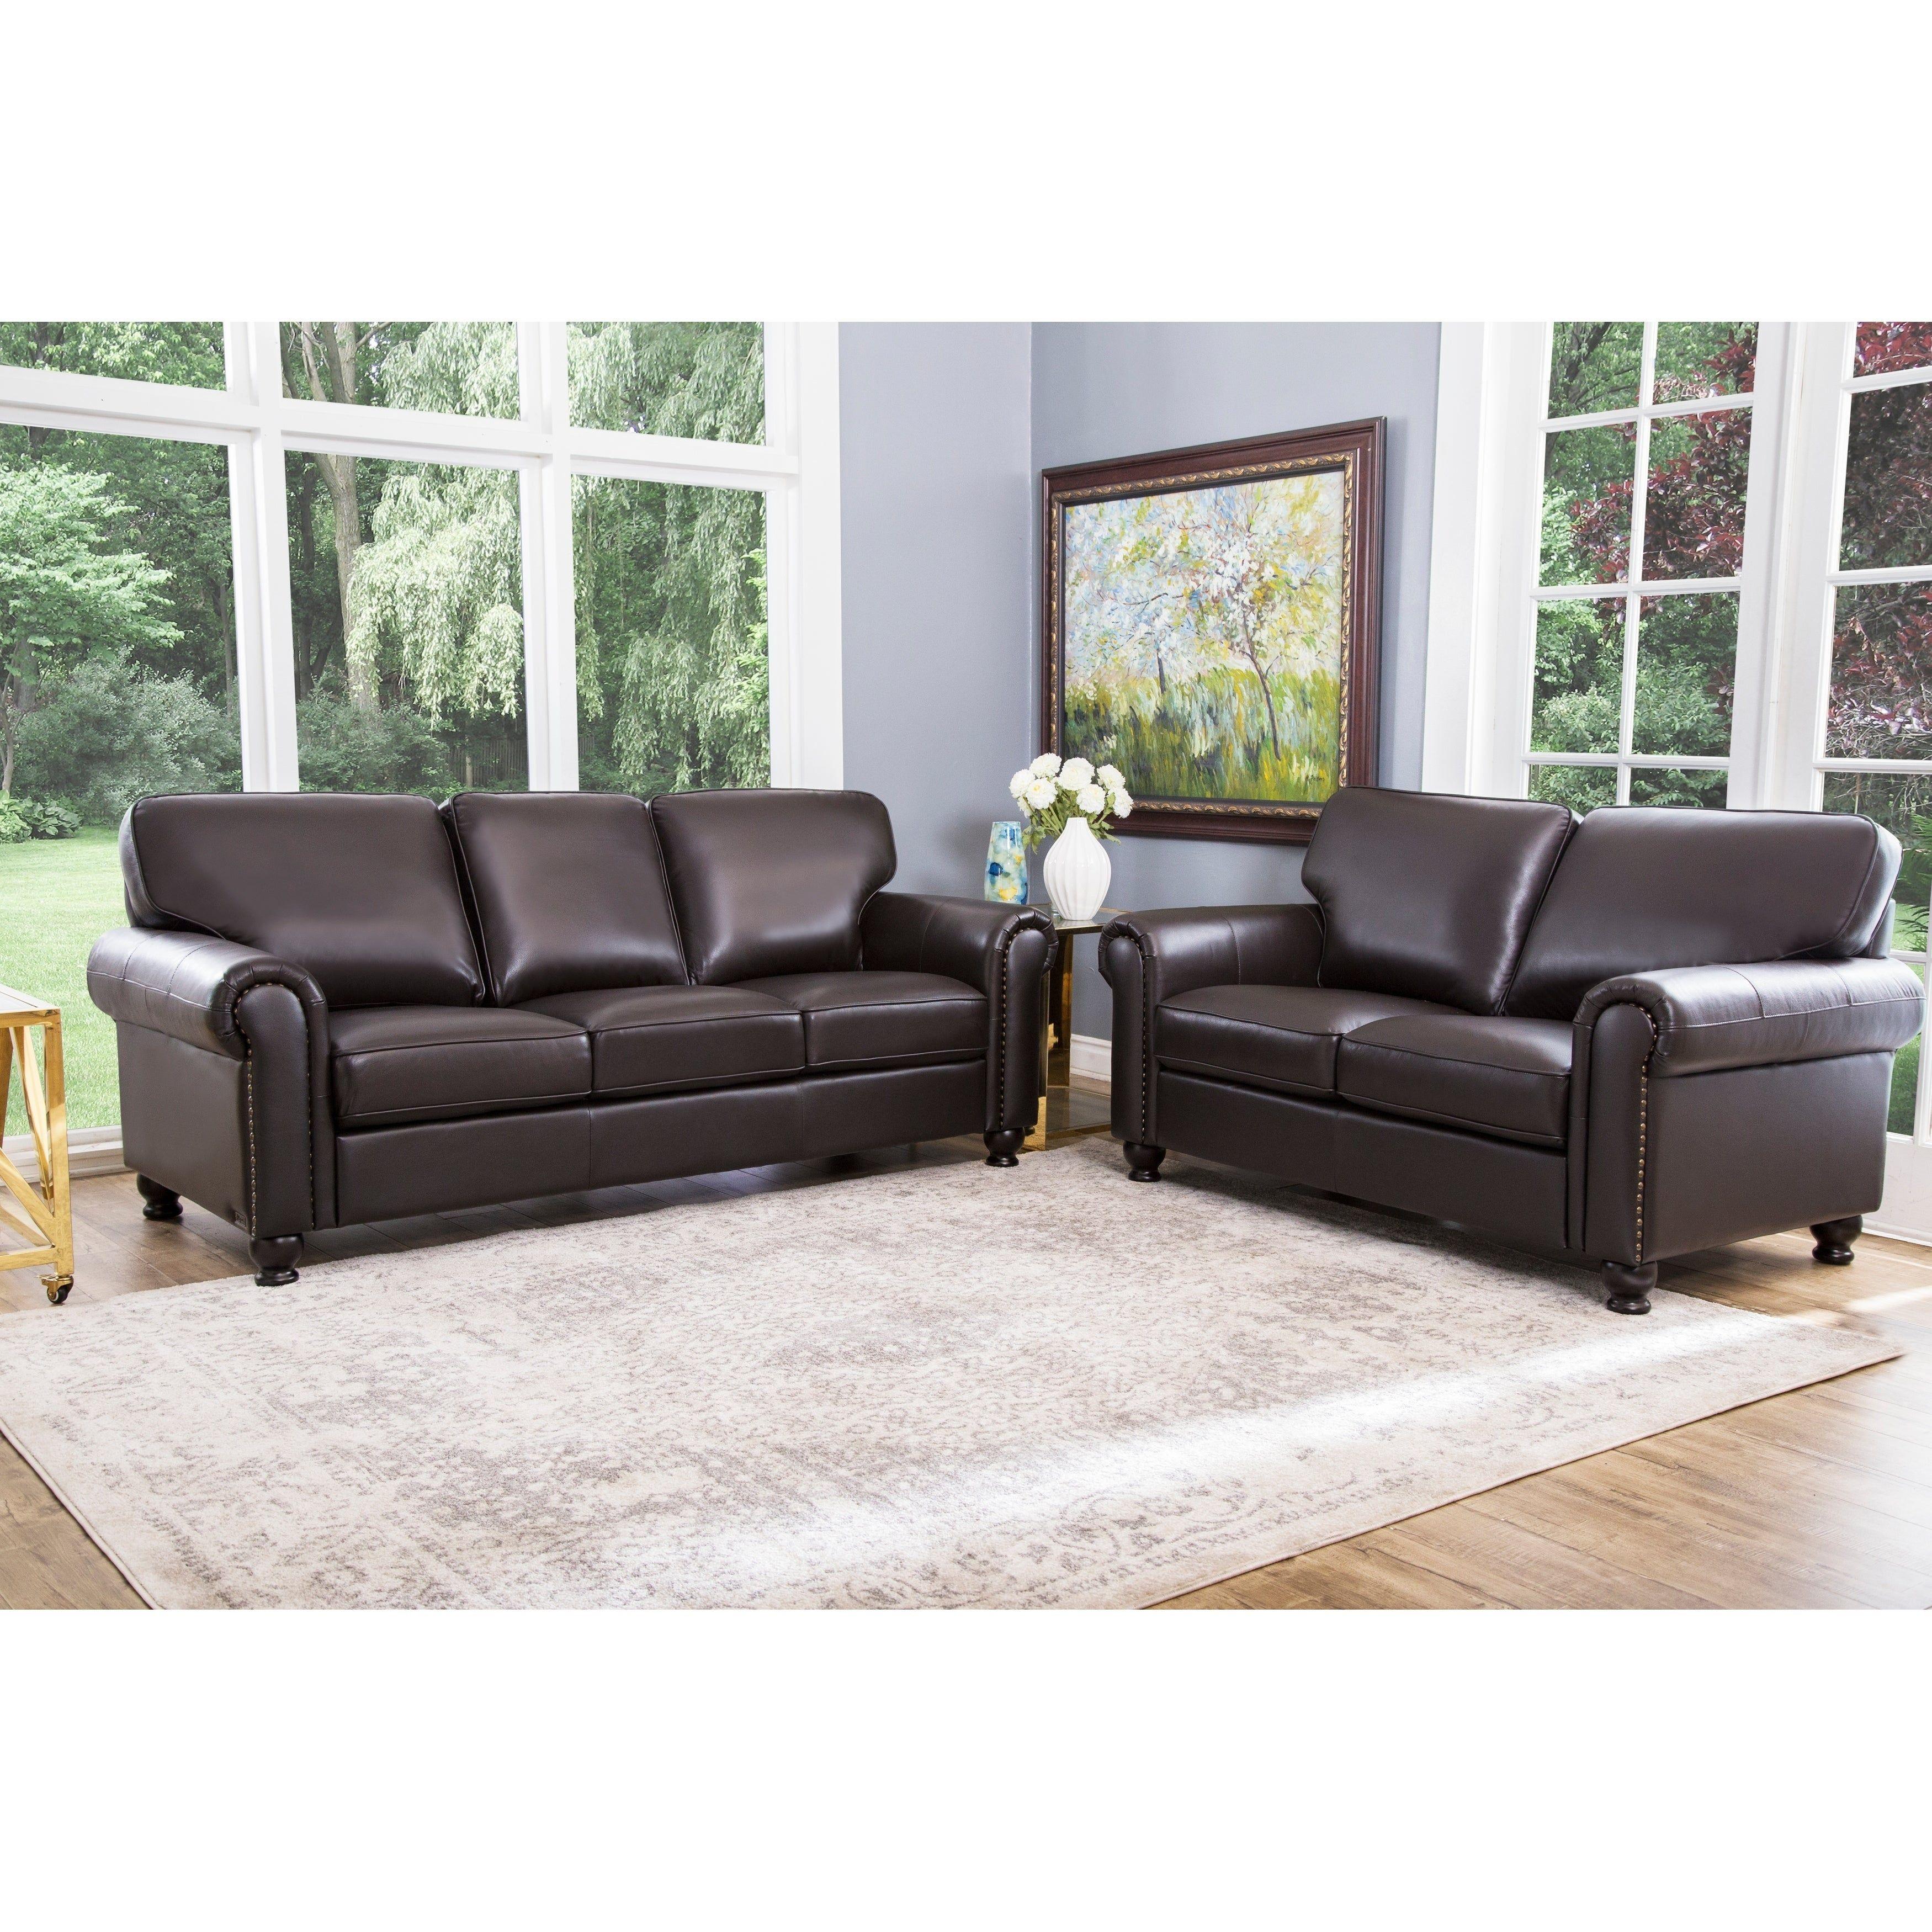 11 Smart Designs Of How To Make 3 Piece Living Room Set Cheap Living Room Sets Living Room Leather Leather Living Room Set